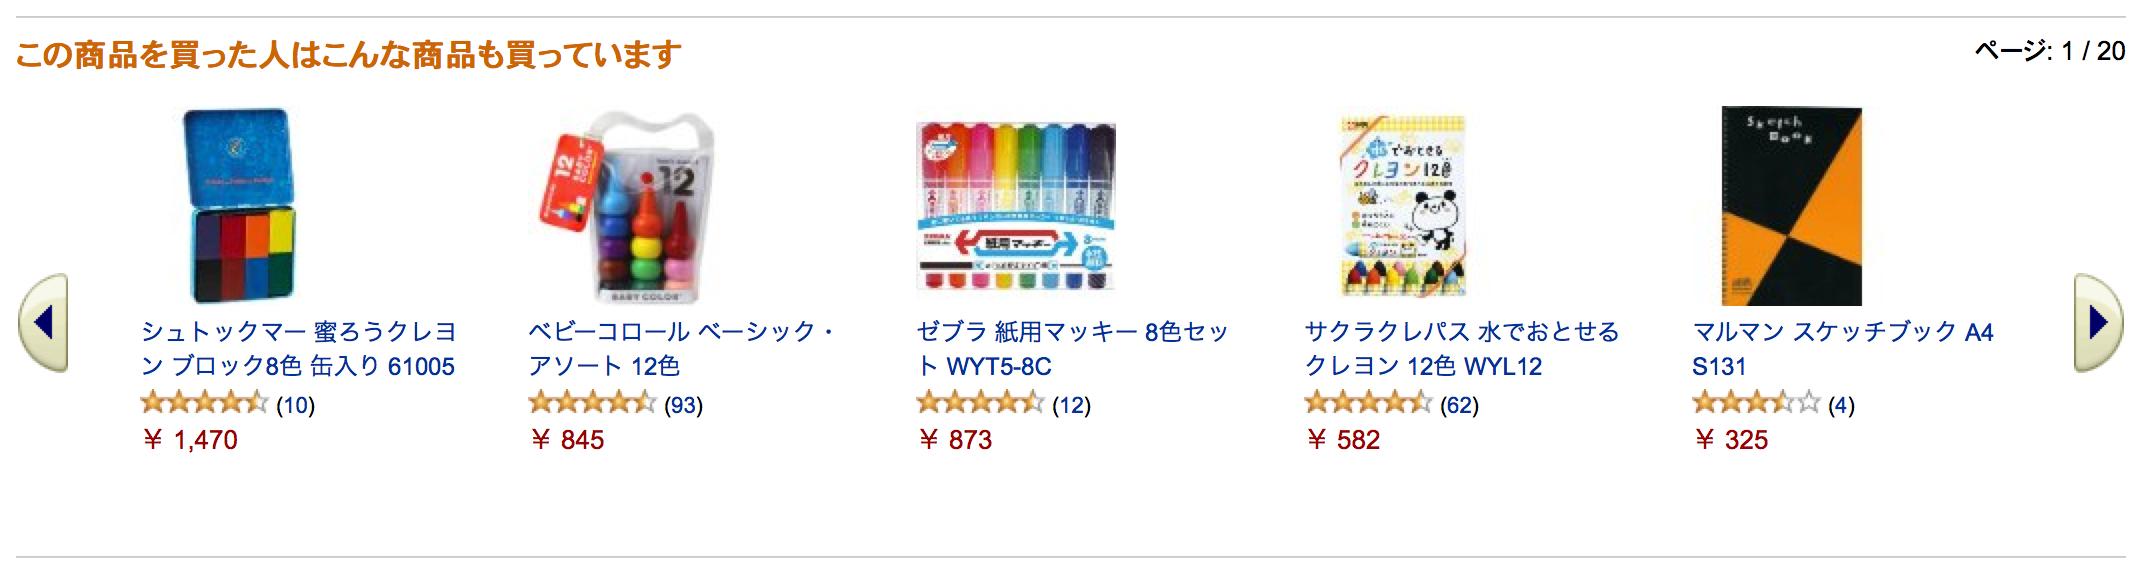 Amazon (amazon.co.jp) における「この商品を買った人はこんな商品も買っています」のカルーセル